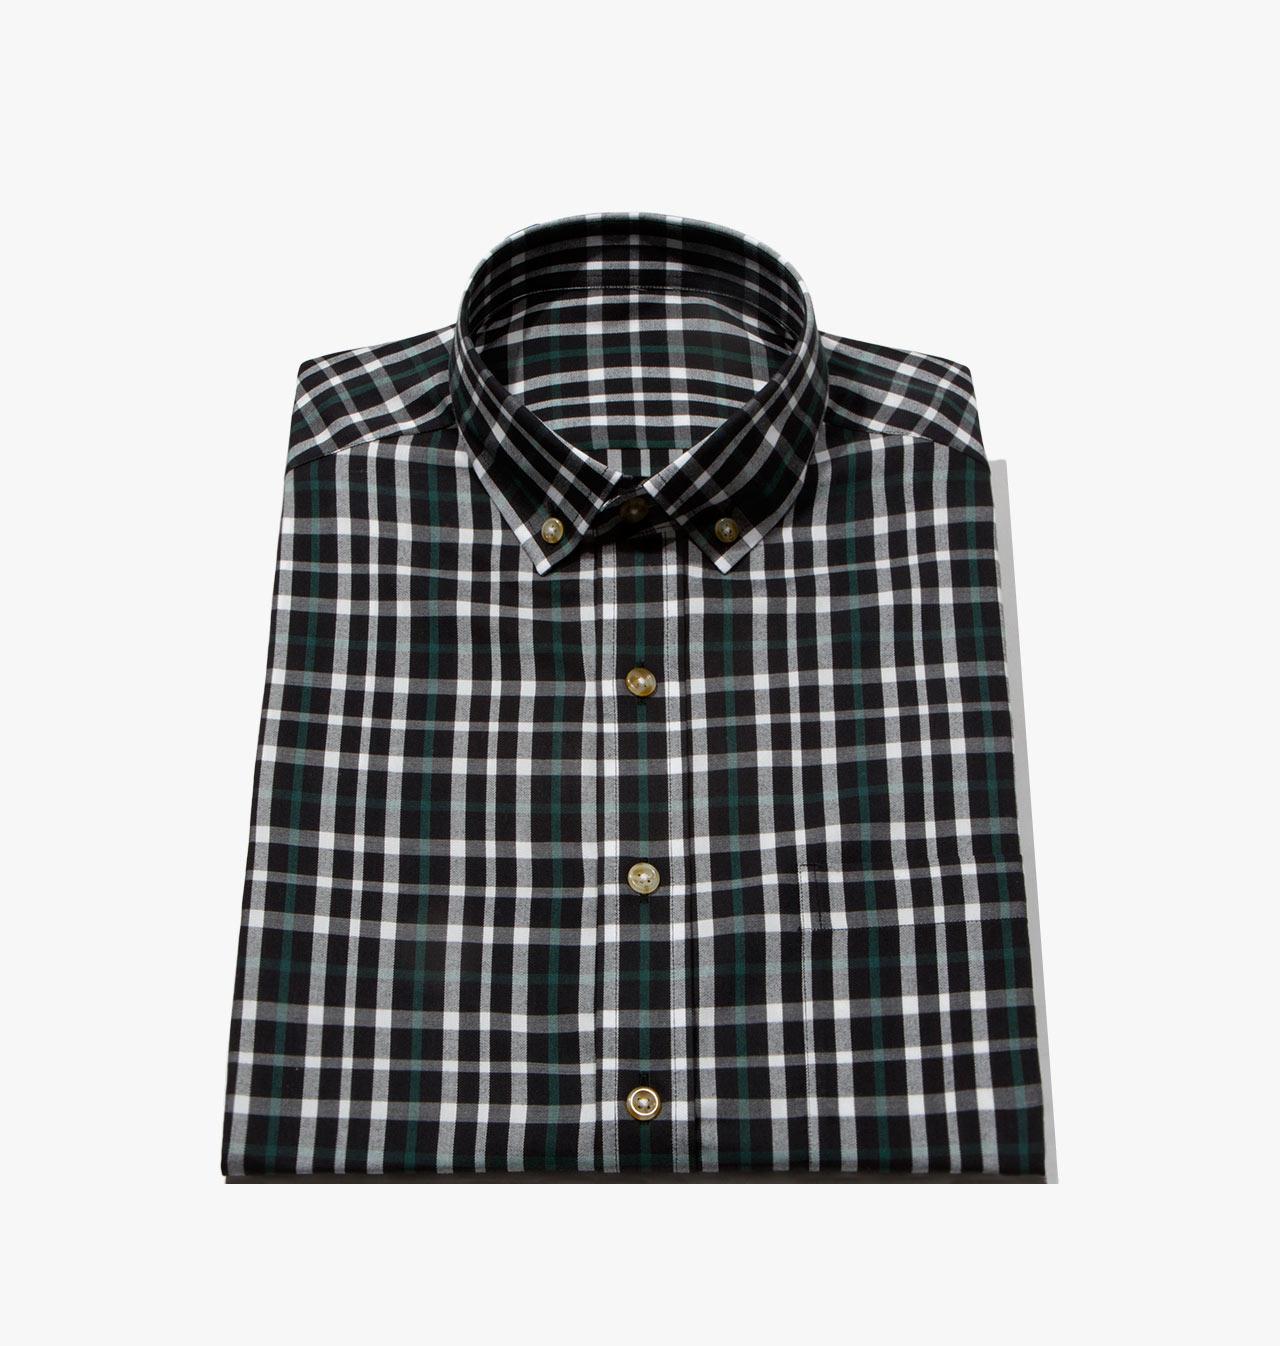 Shirt design online uk - Shirt Design Online Uk 69